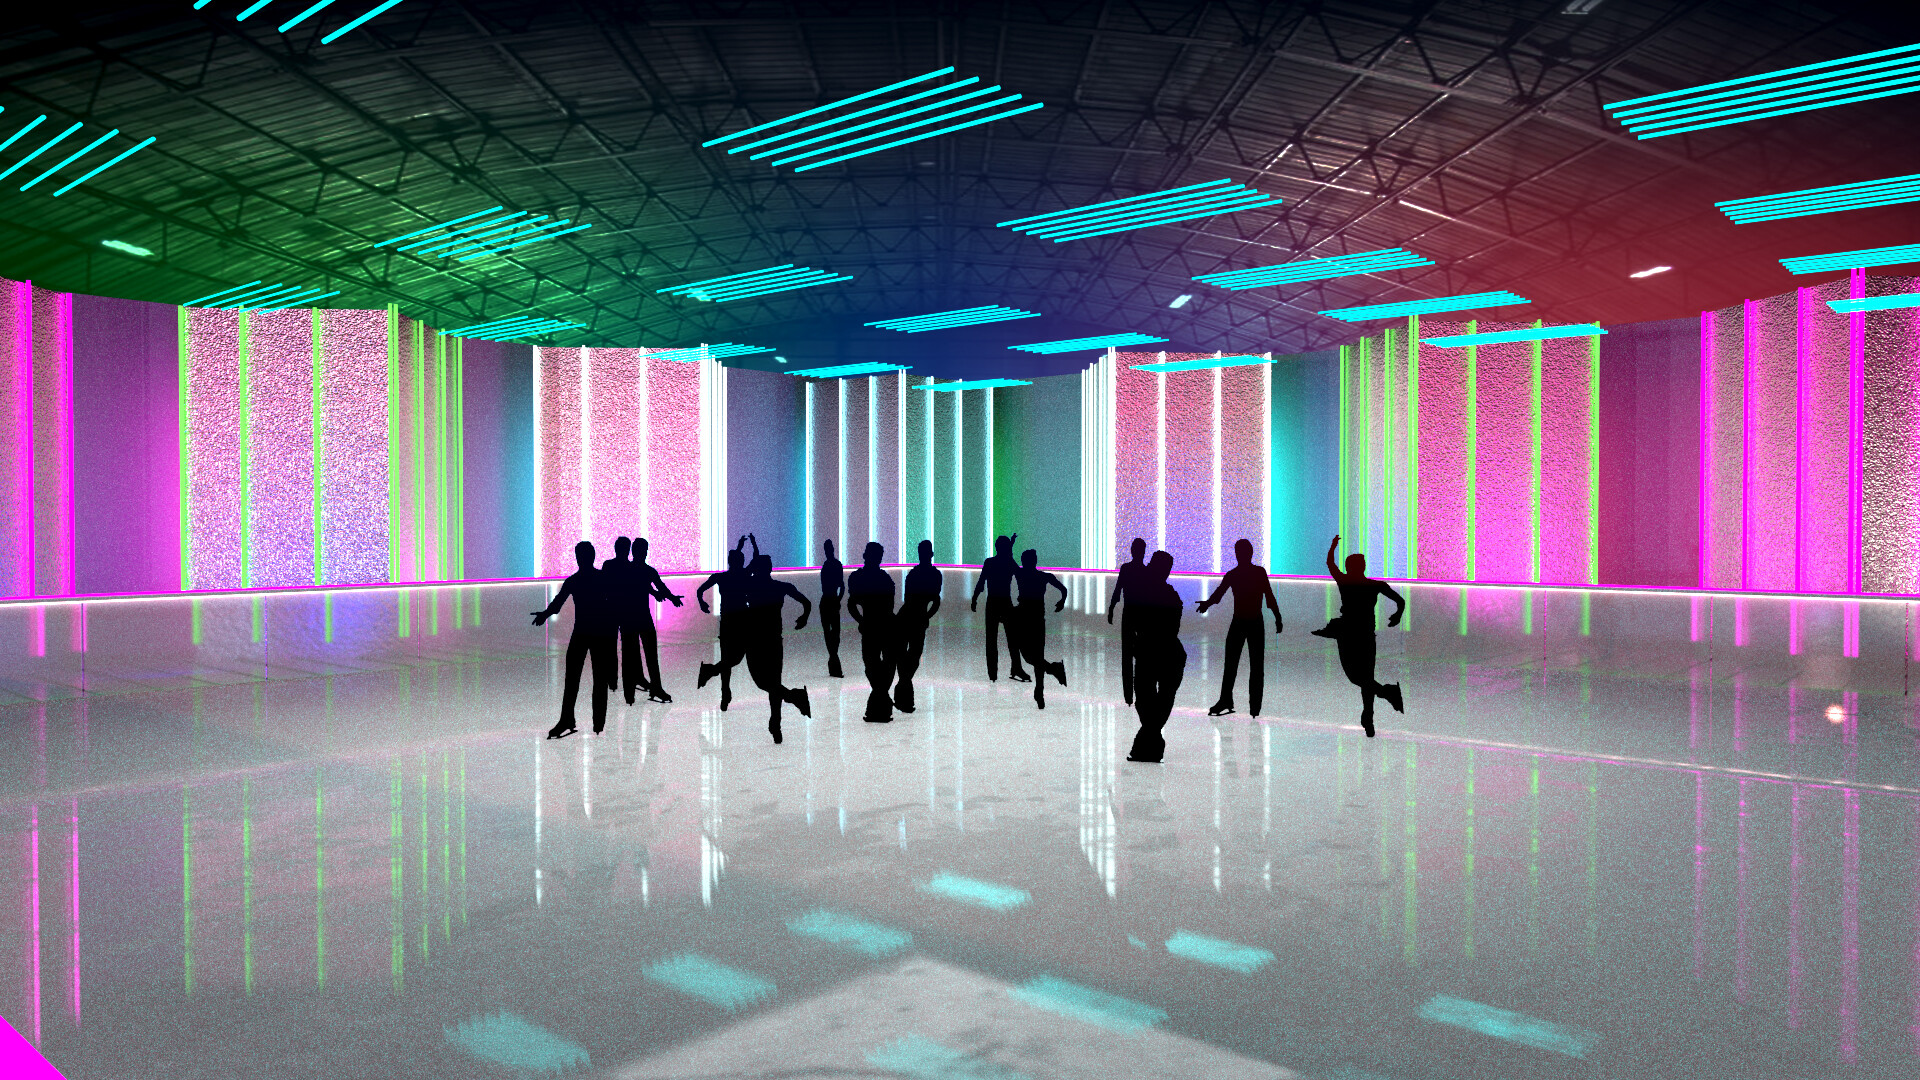 Imery watson set walls neon multi toplight venuelightsgrid2 blue 240tubes bg